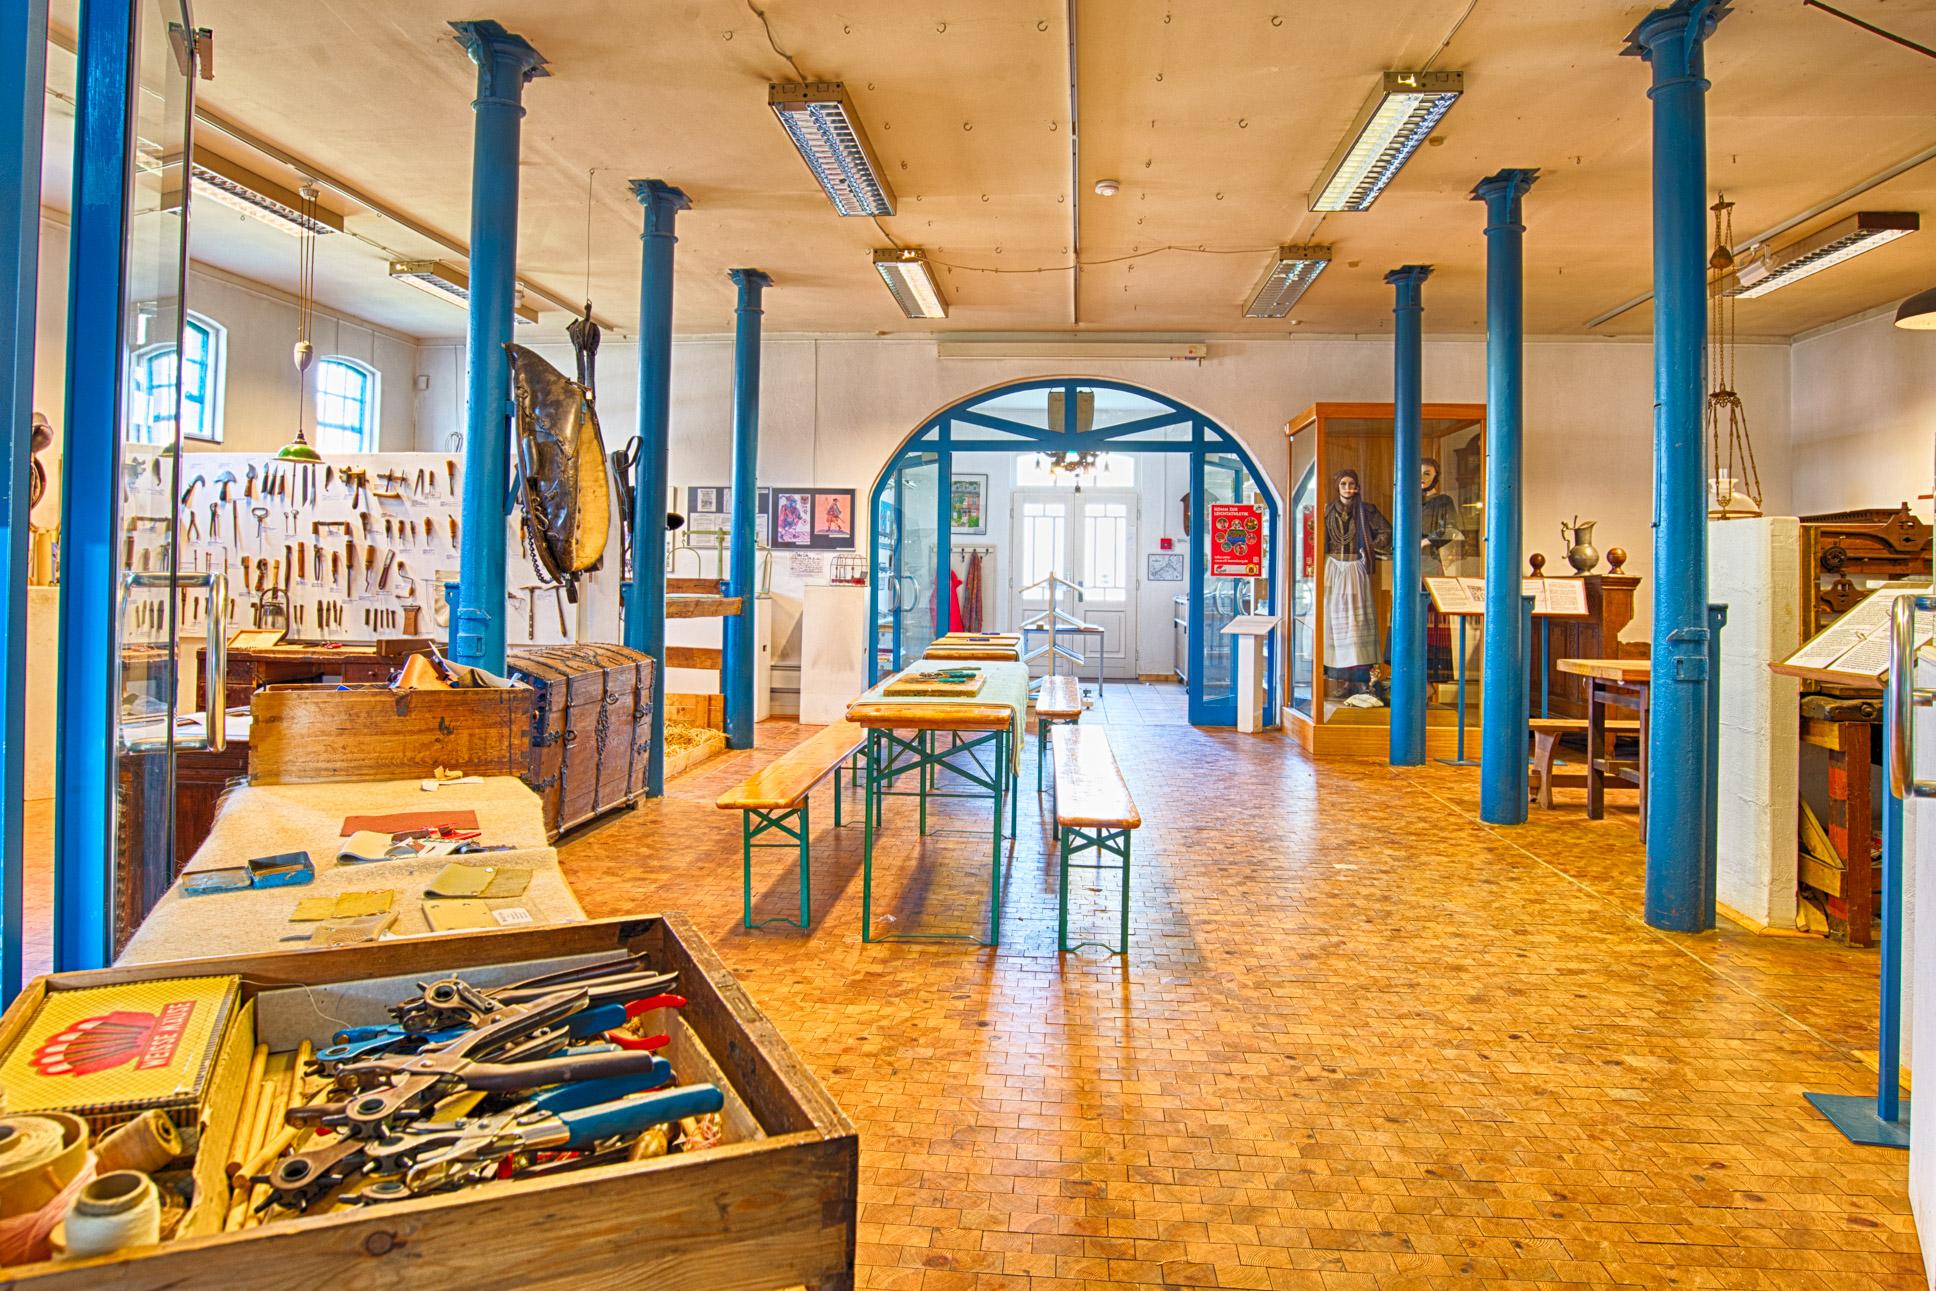 Handwerksmuseum-Horneburg-Rundgang2018-2869_HDR-27